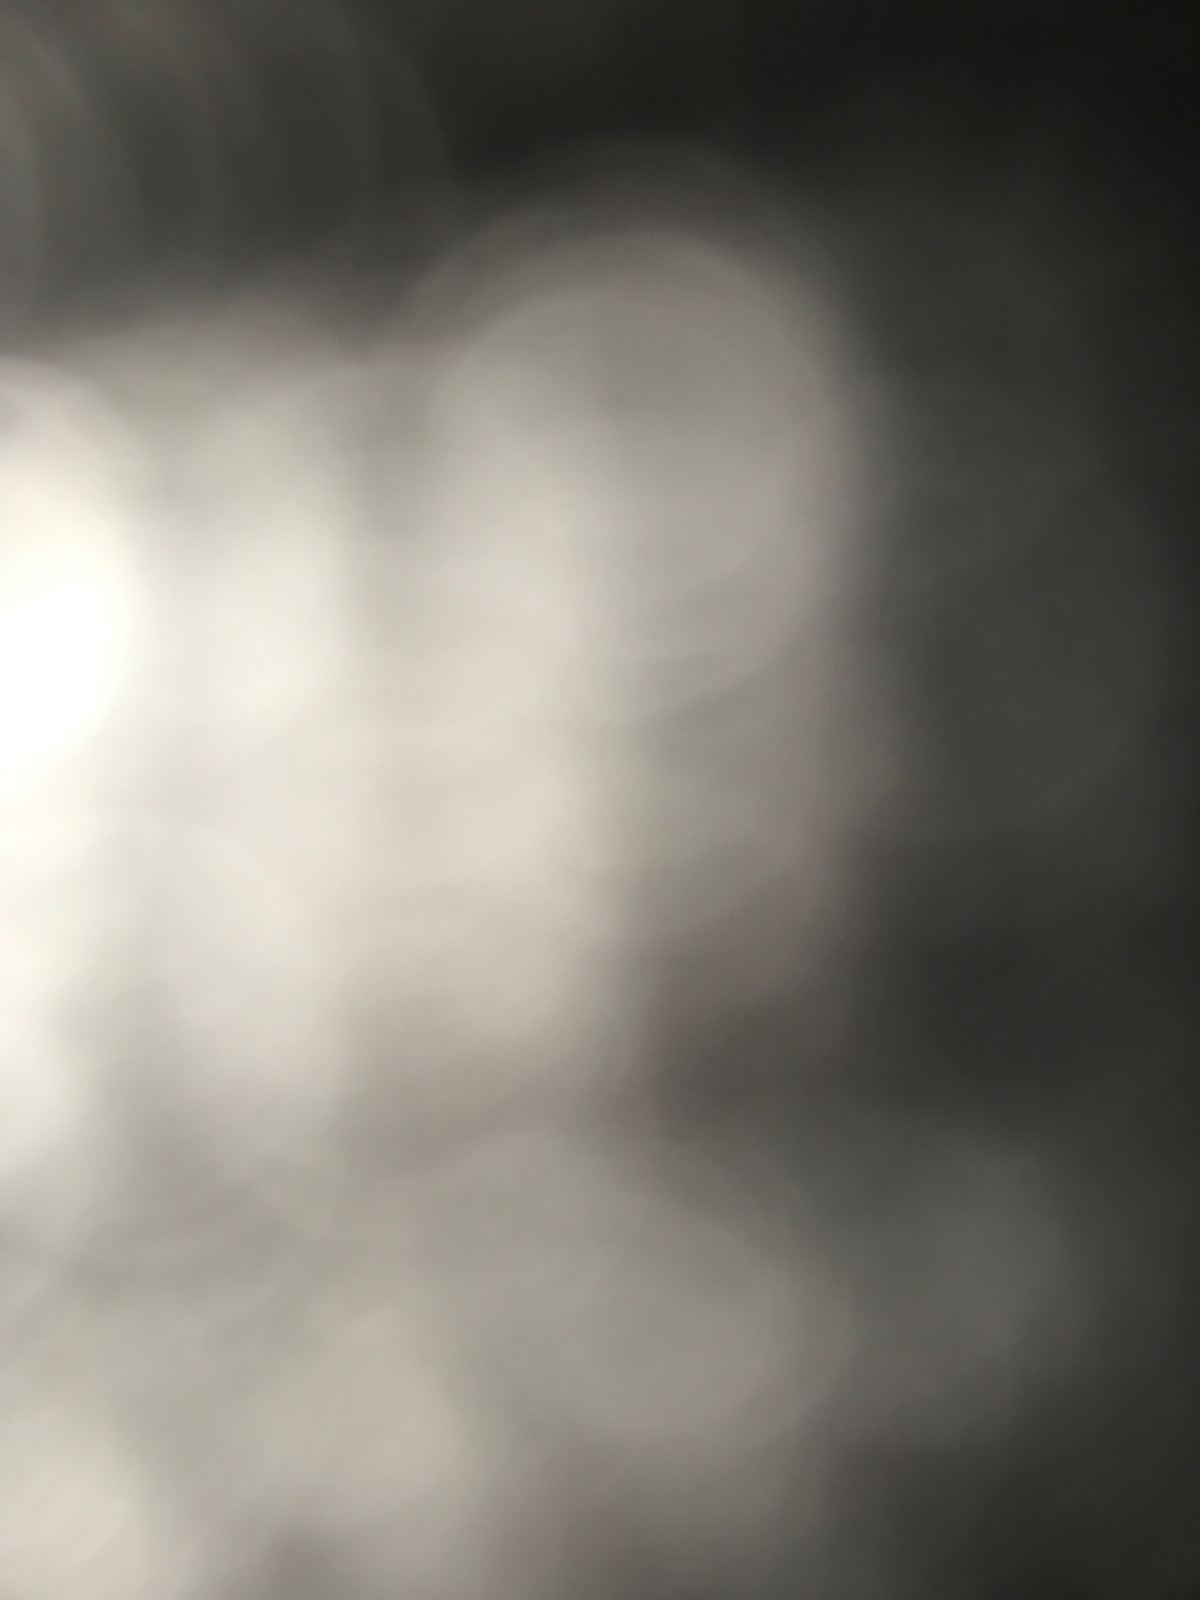 Bokeh accidental photography ❤️ - angietherose | ello